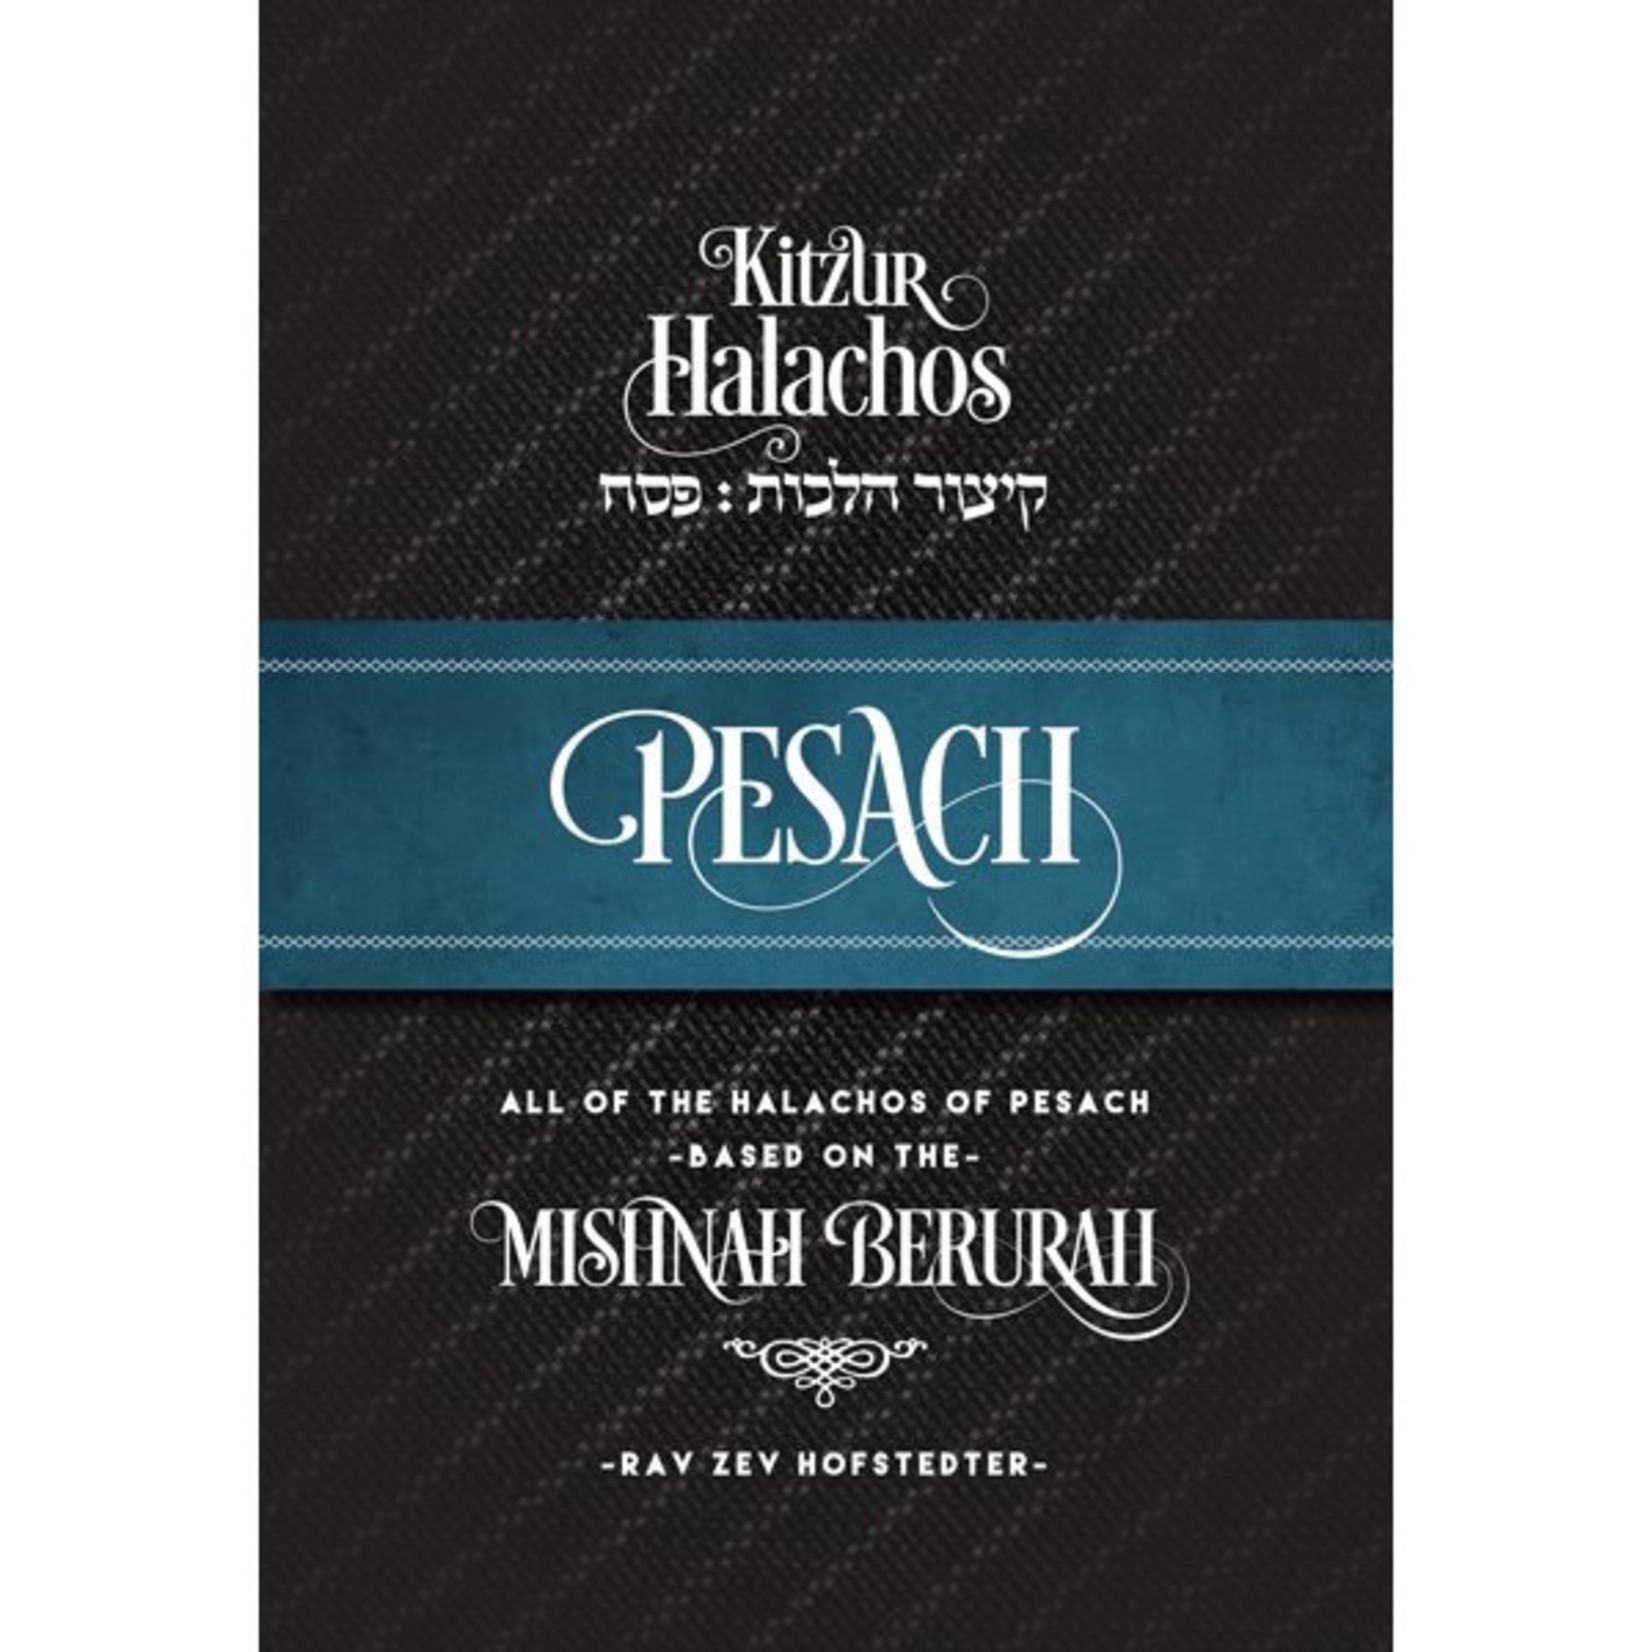 Kitzur Halachos Pesach